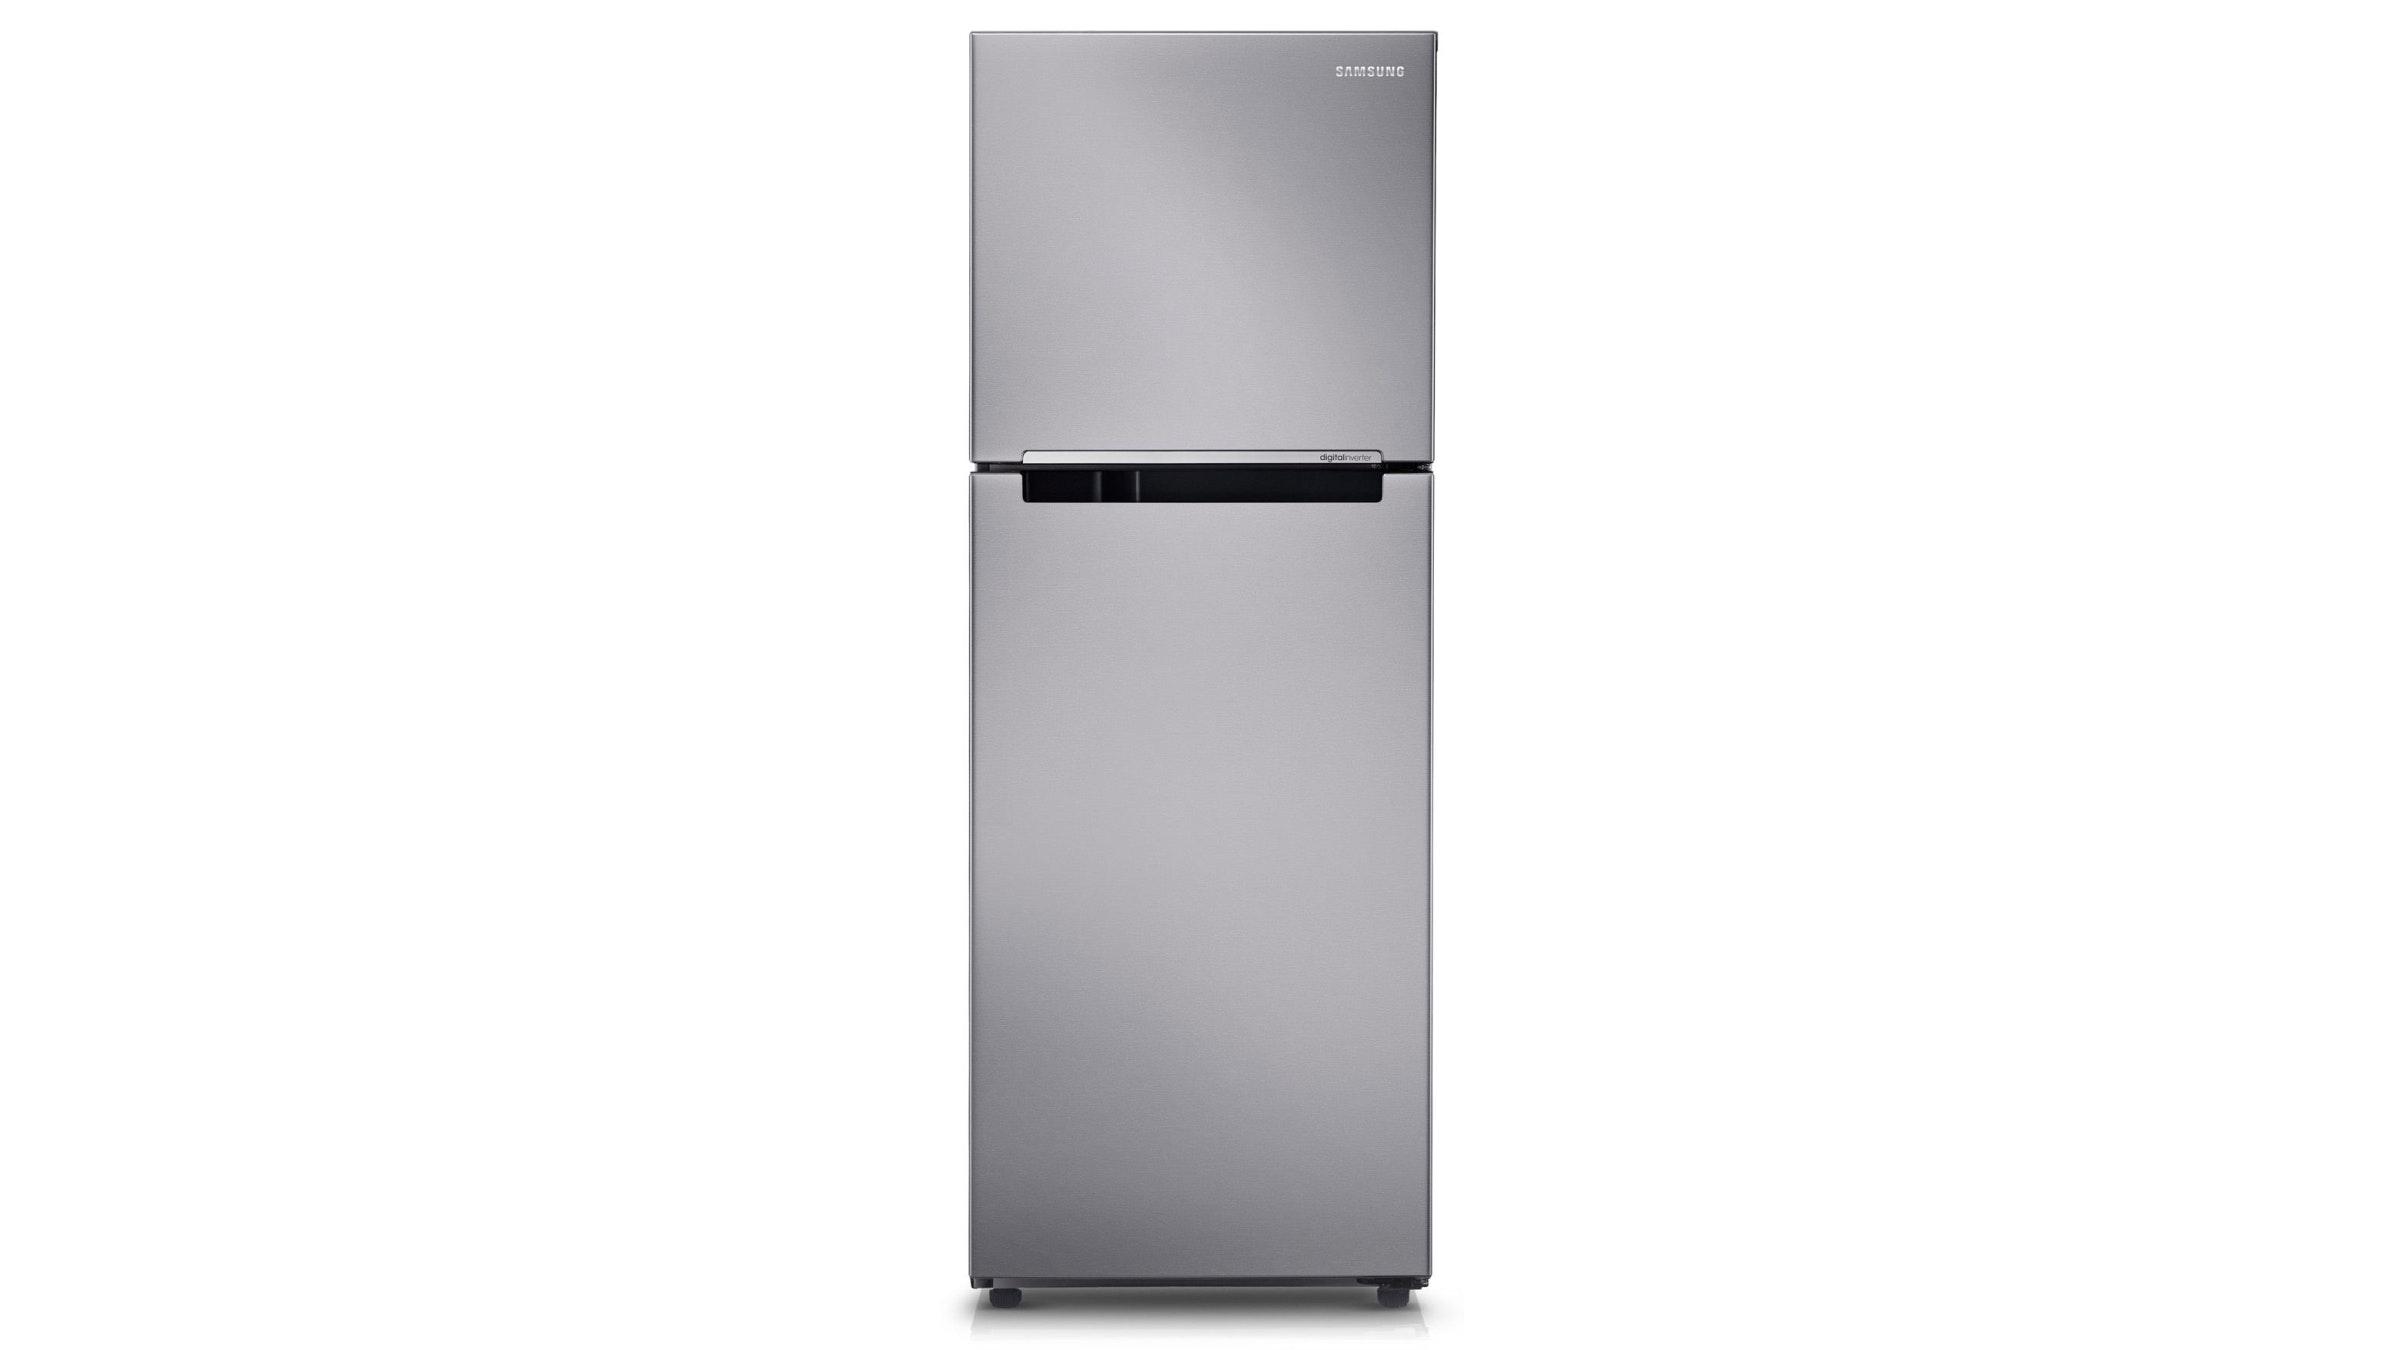 Samsung Rt22 234l Top Mount Refrigerator Harvey Norman